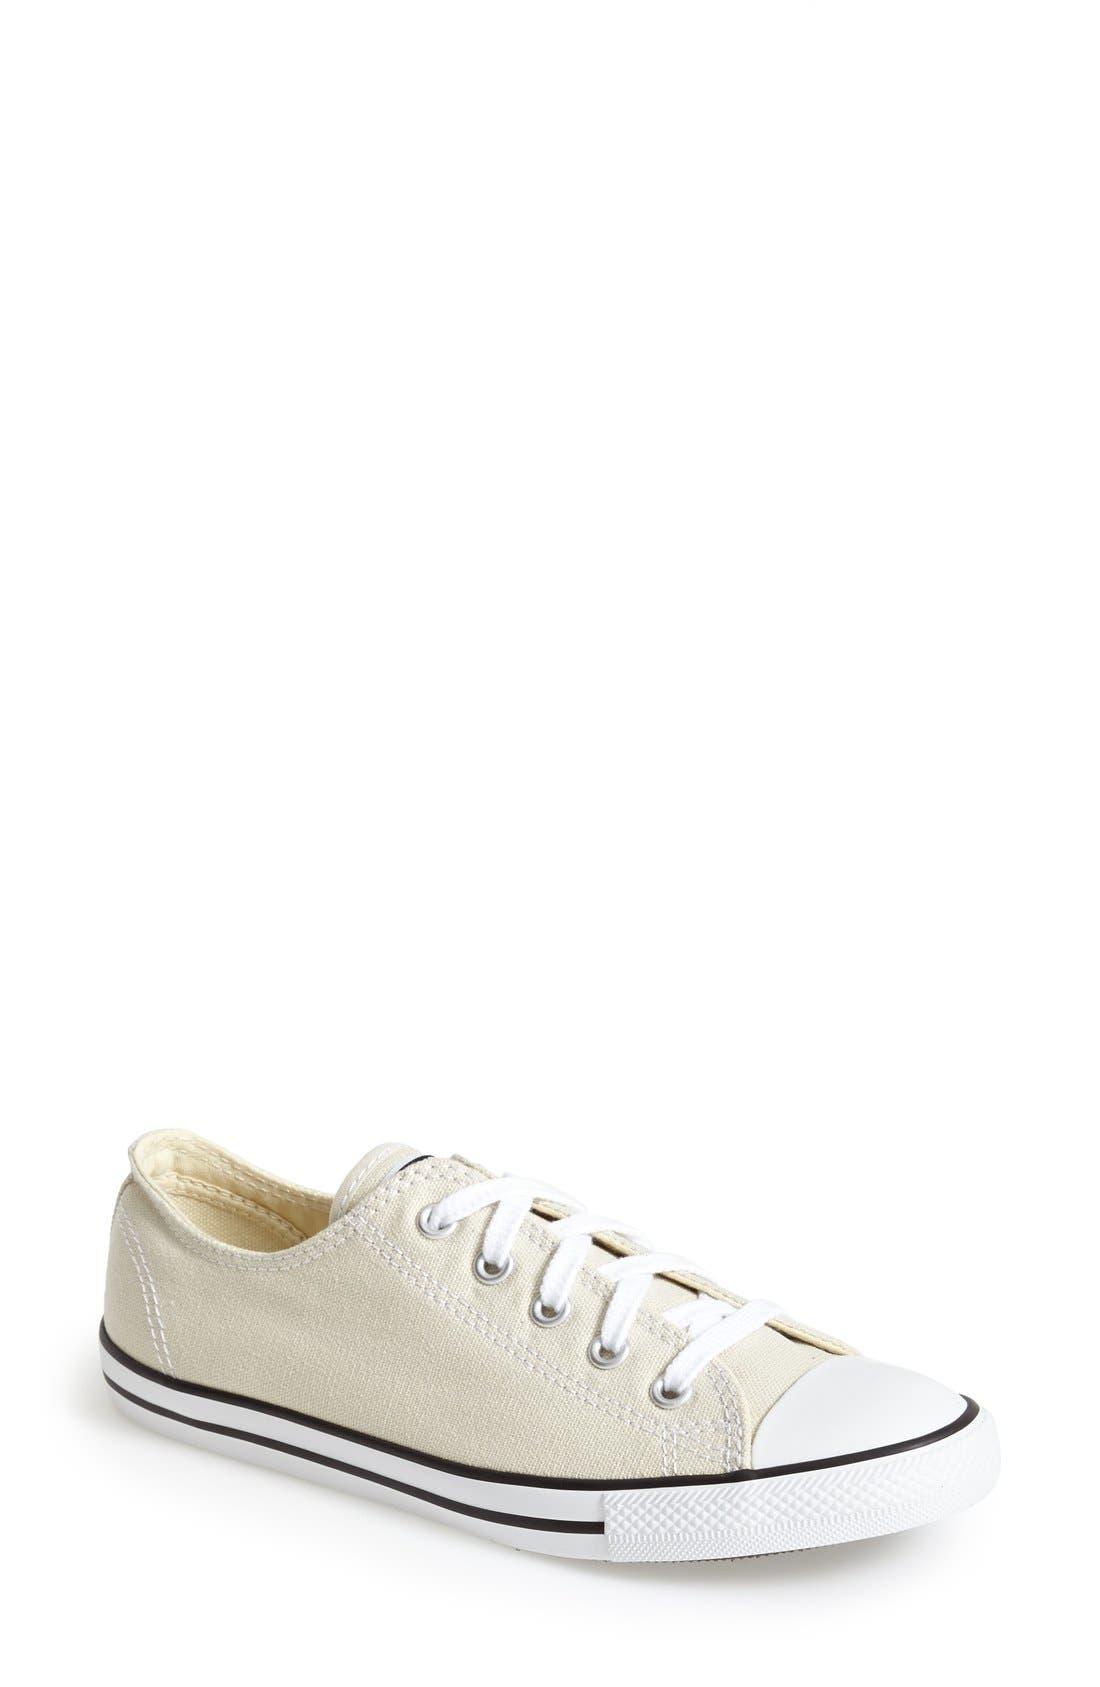 Alternate Image 1 Selected - Converse Chuck Taylor® 'Dainty' Sneaker (Women)